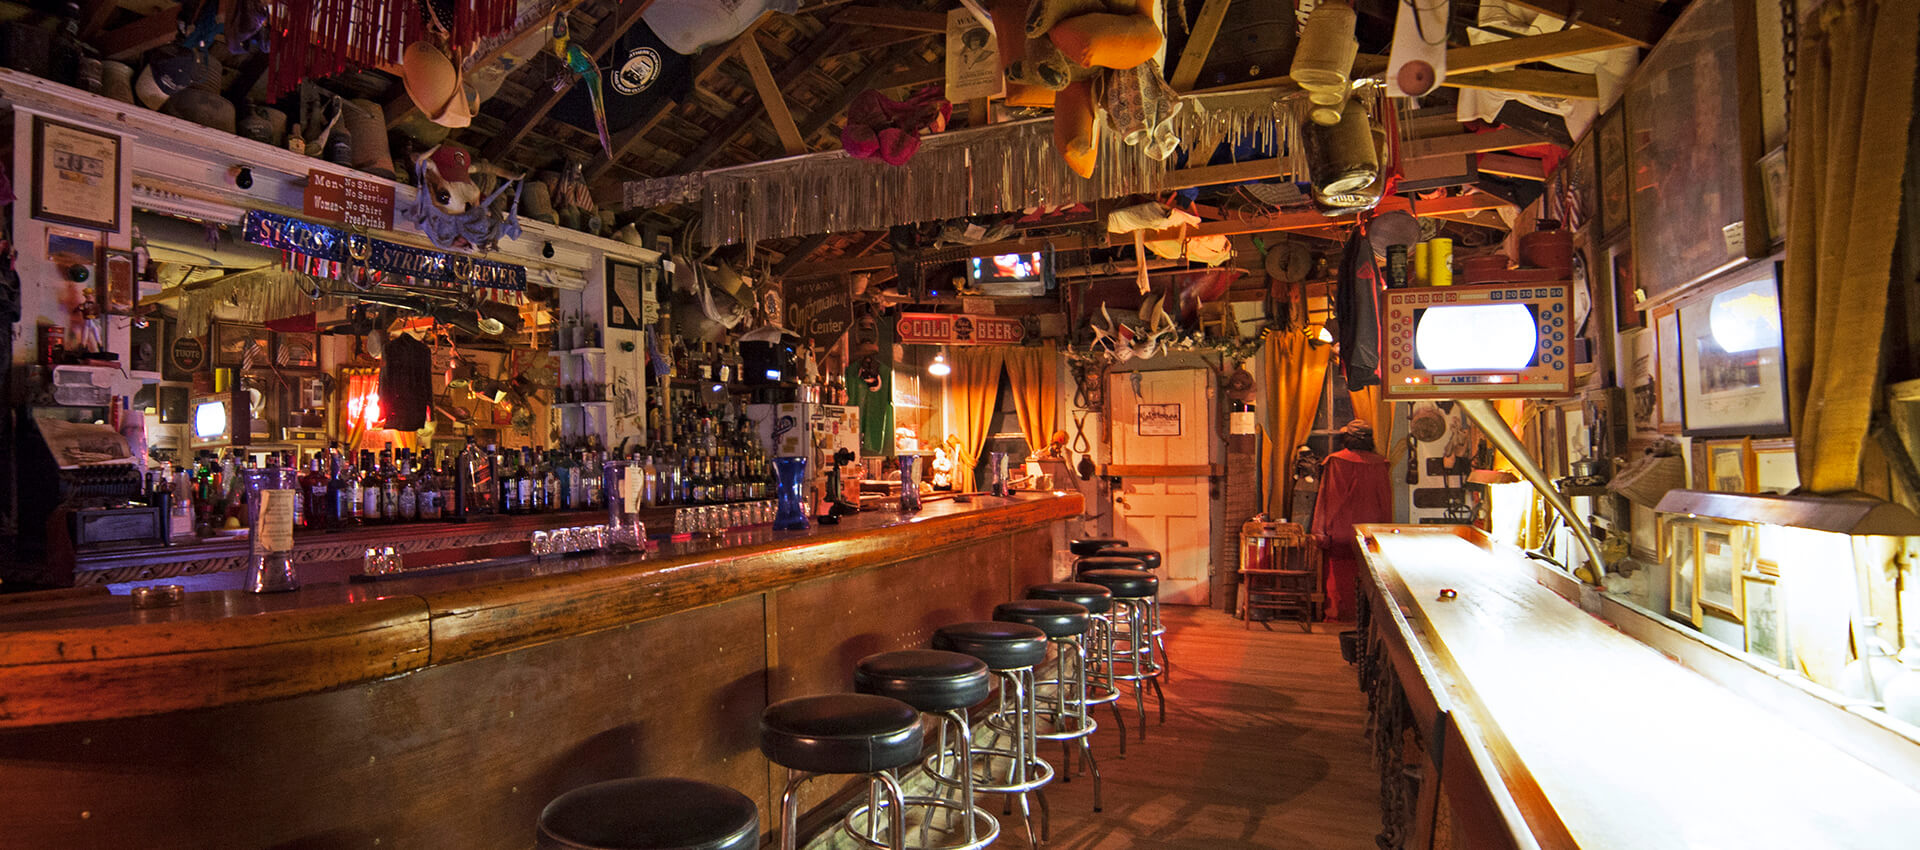 Sagebrush Saloons, Historic Bar, Historic Saloons, Nevada bar, Nevada saloon